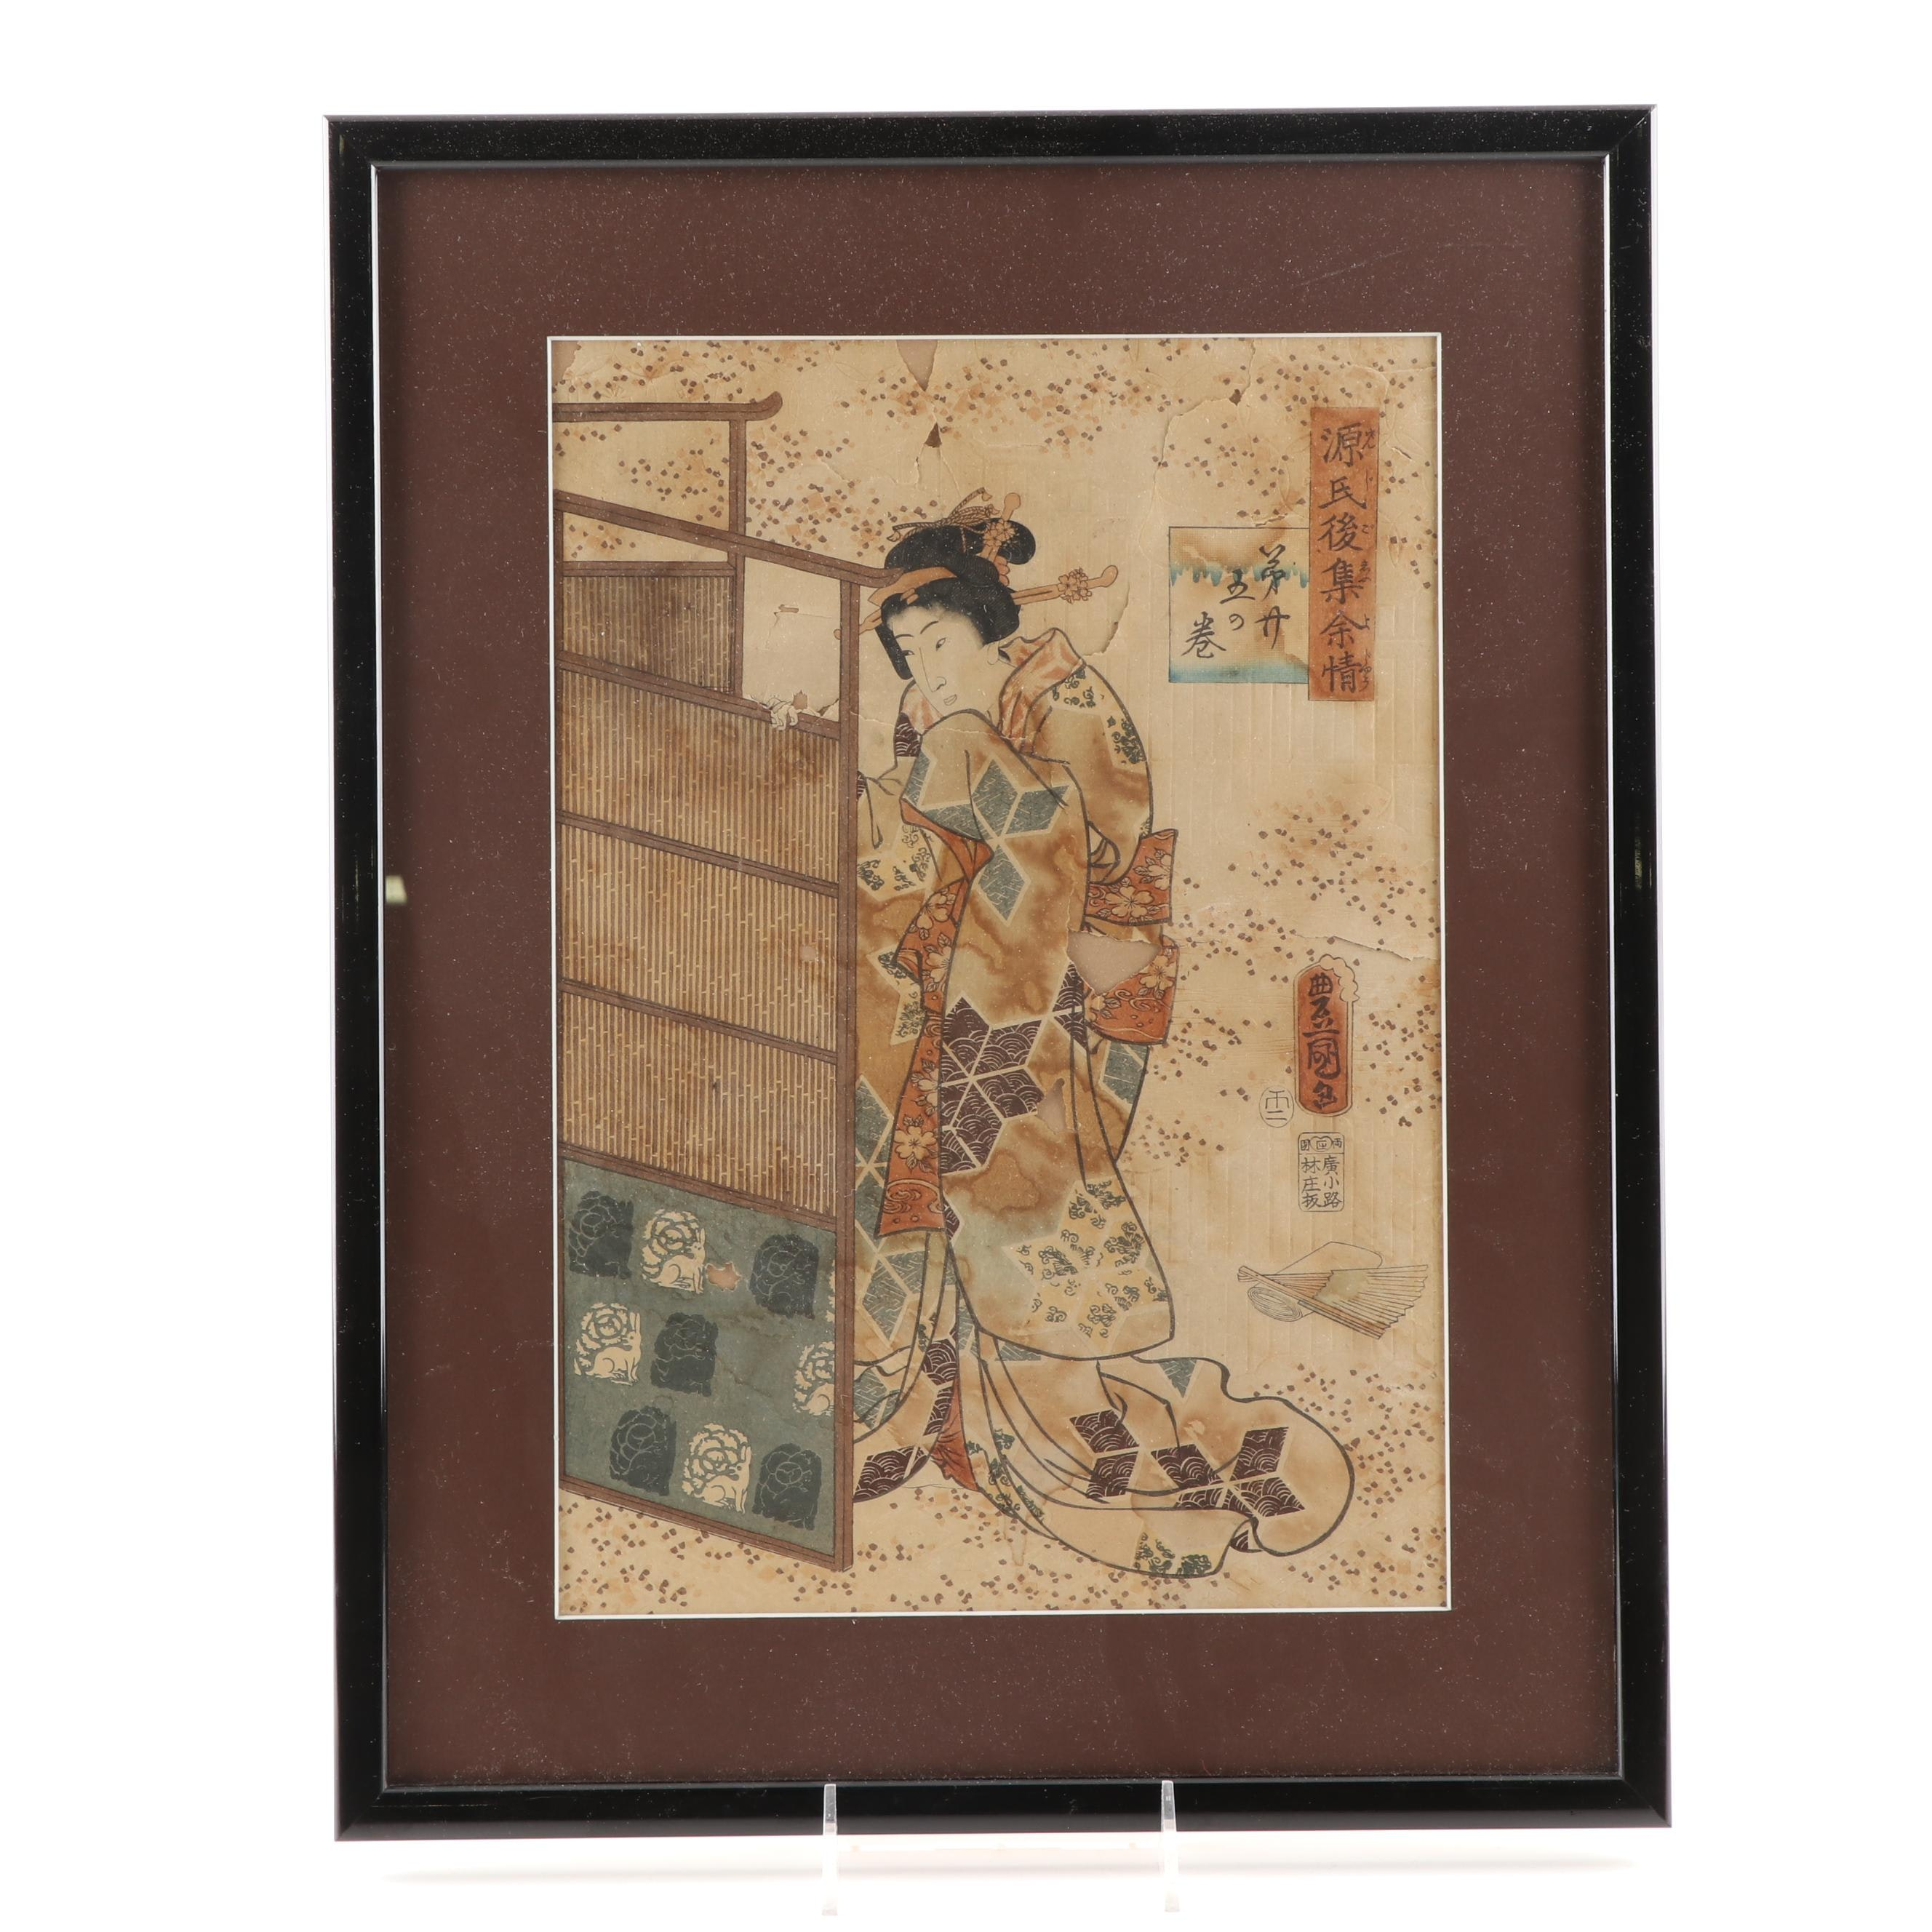 Utagawa Kunisada Ukiyo-e Woodblock